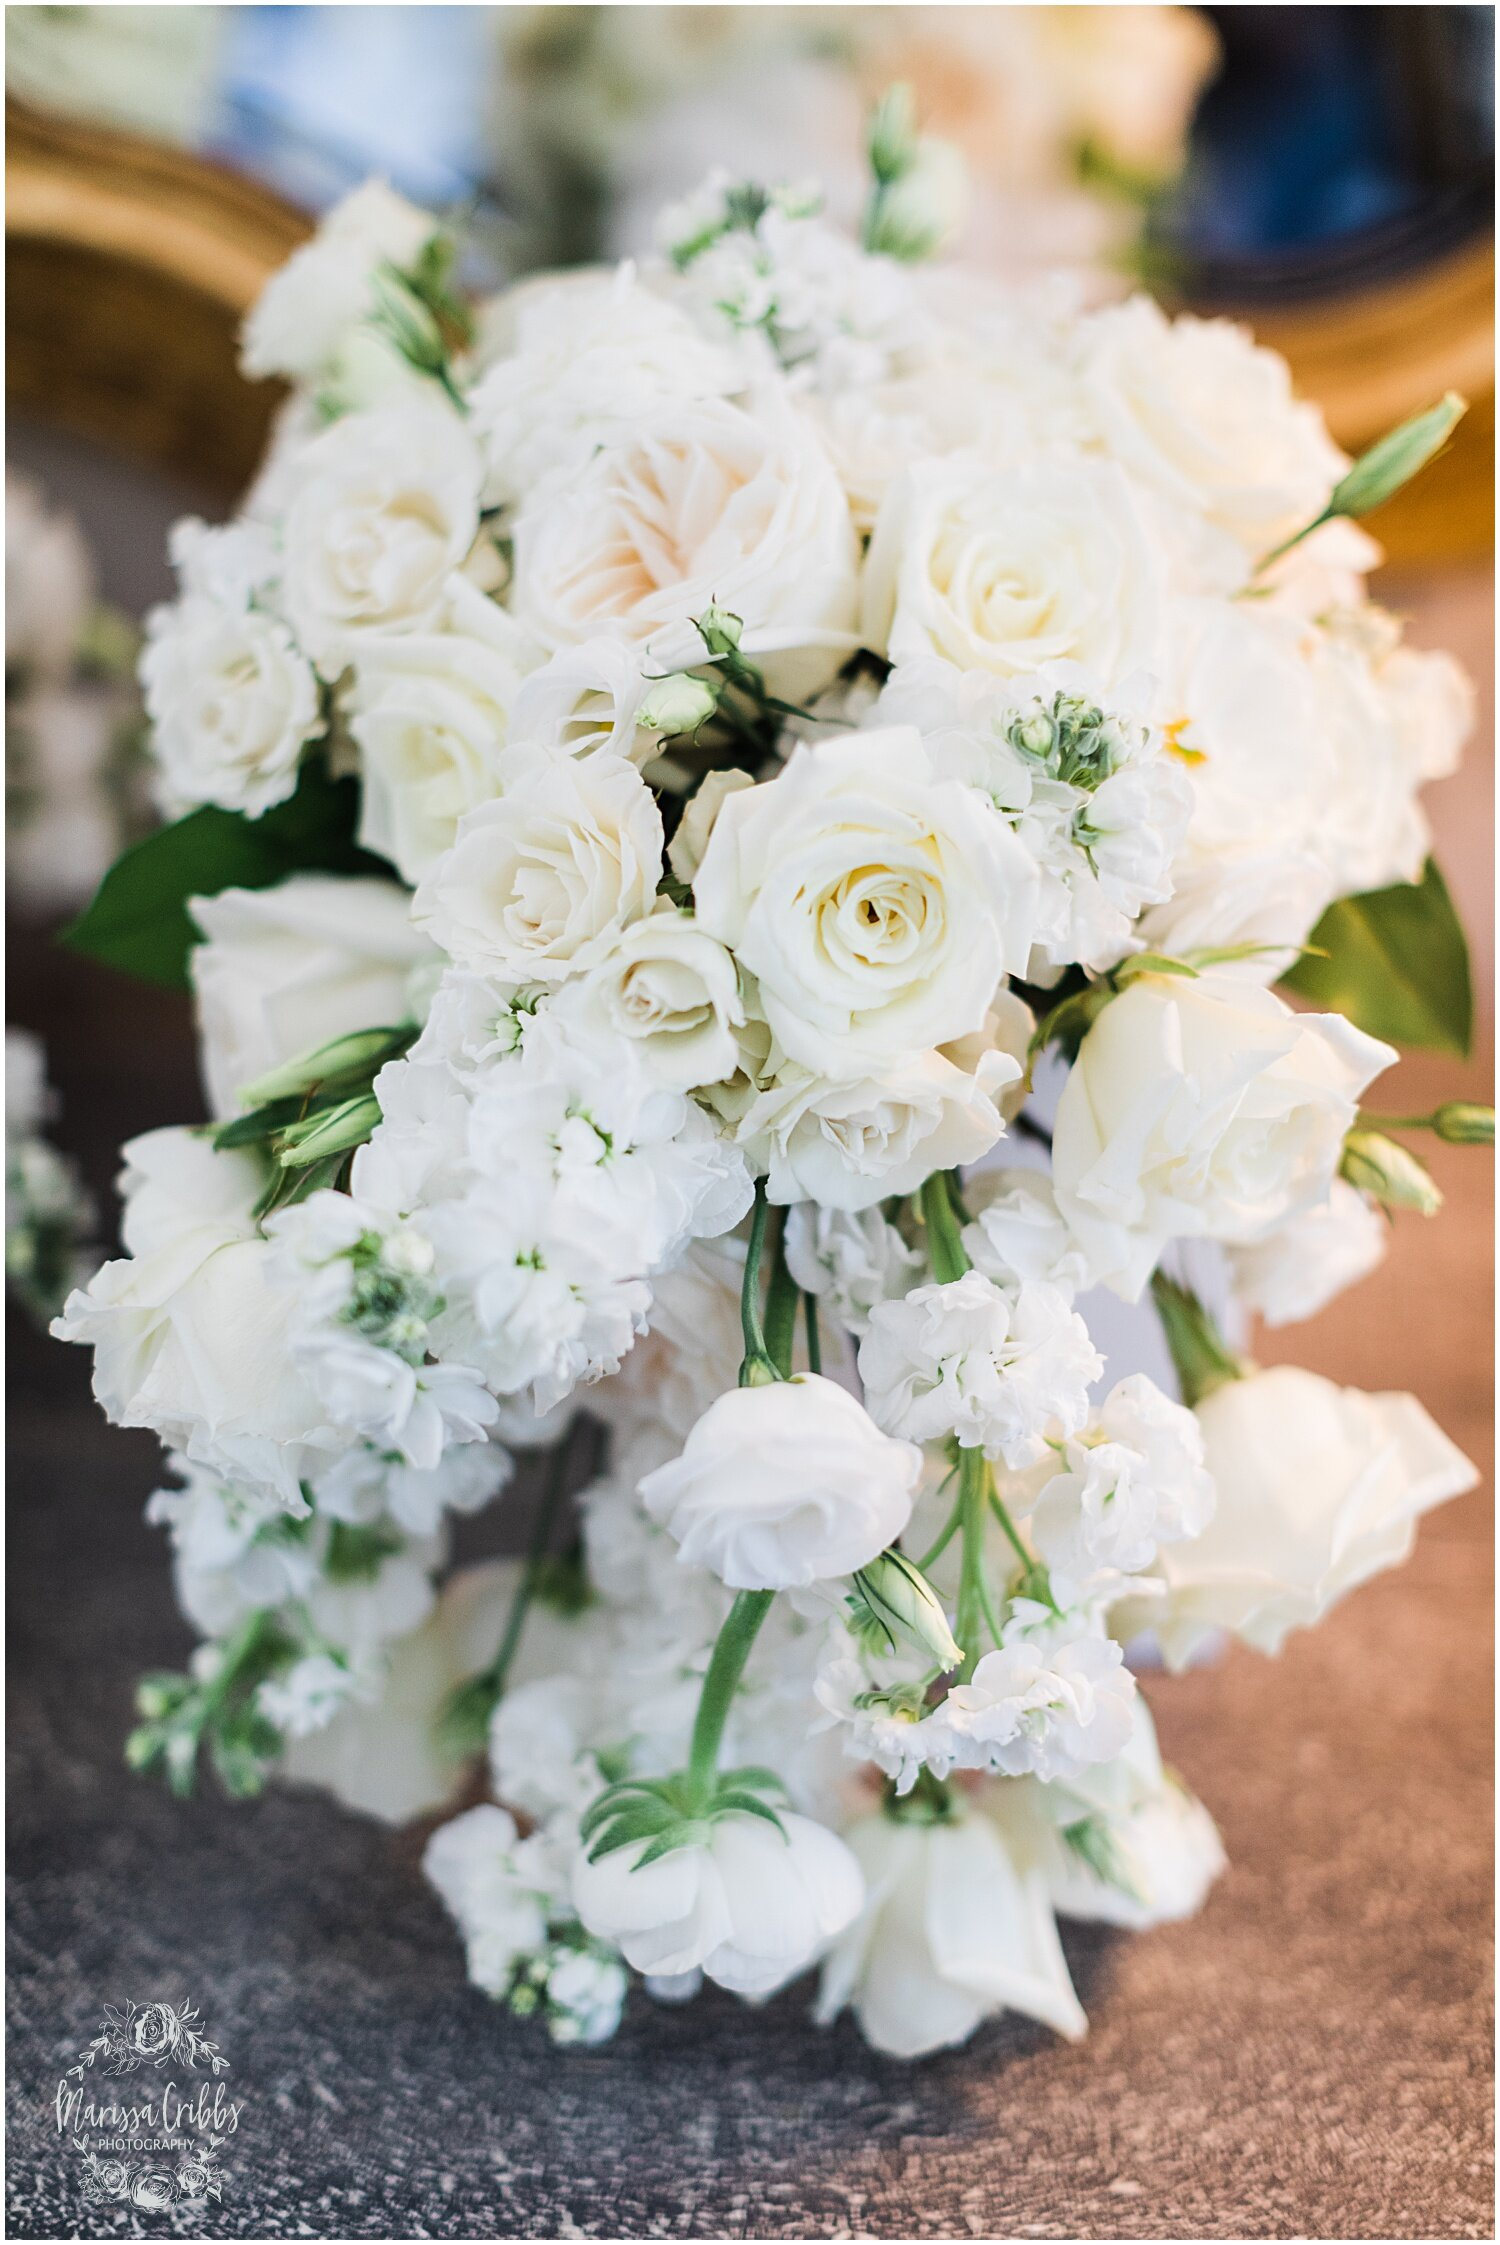 TYLER & CAROLINE MARRIED BLOG | MARISSA CRIBBS PHOTOGRAPHY | THE CARRIAGE CLUB | KANSAS CITY WEDDING PHOTOS_9194.jpg